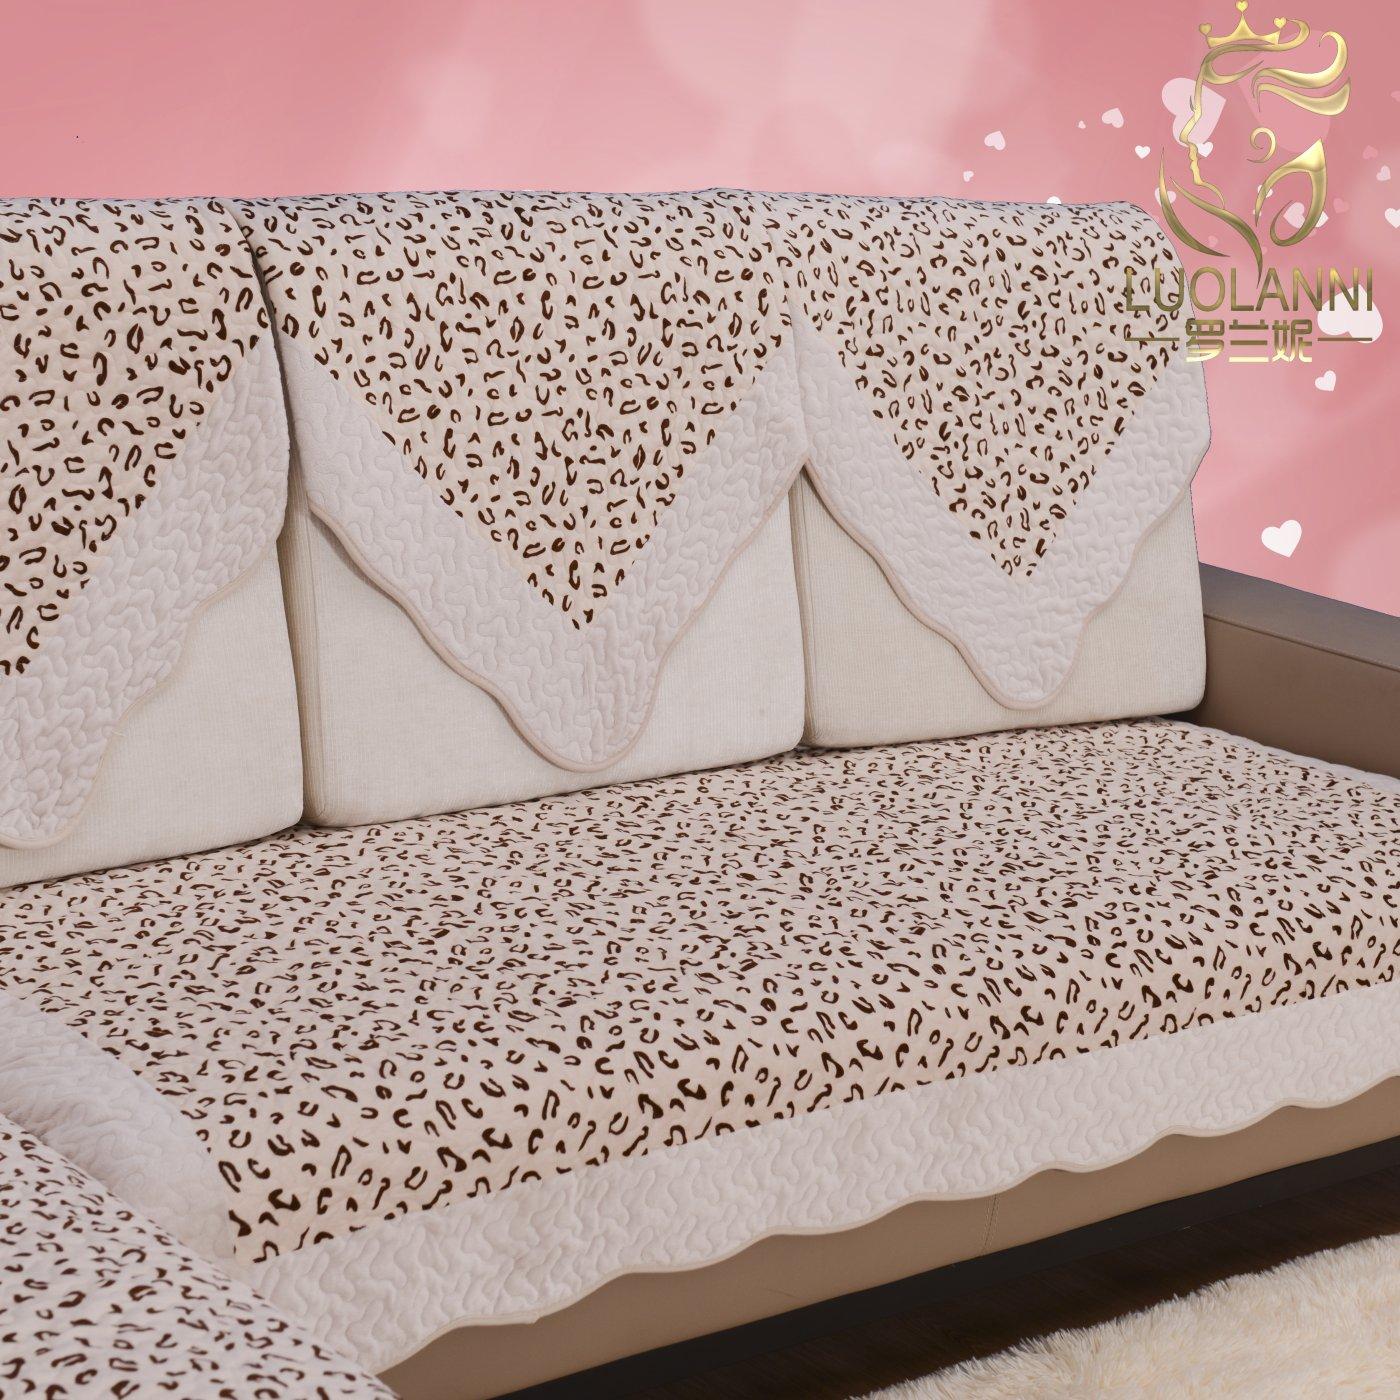 fashion leopard print slip resistant leather sofa mat